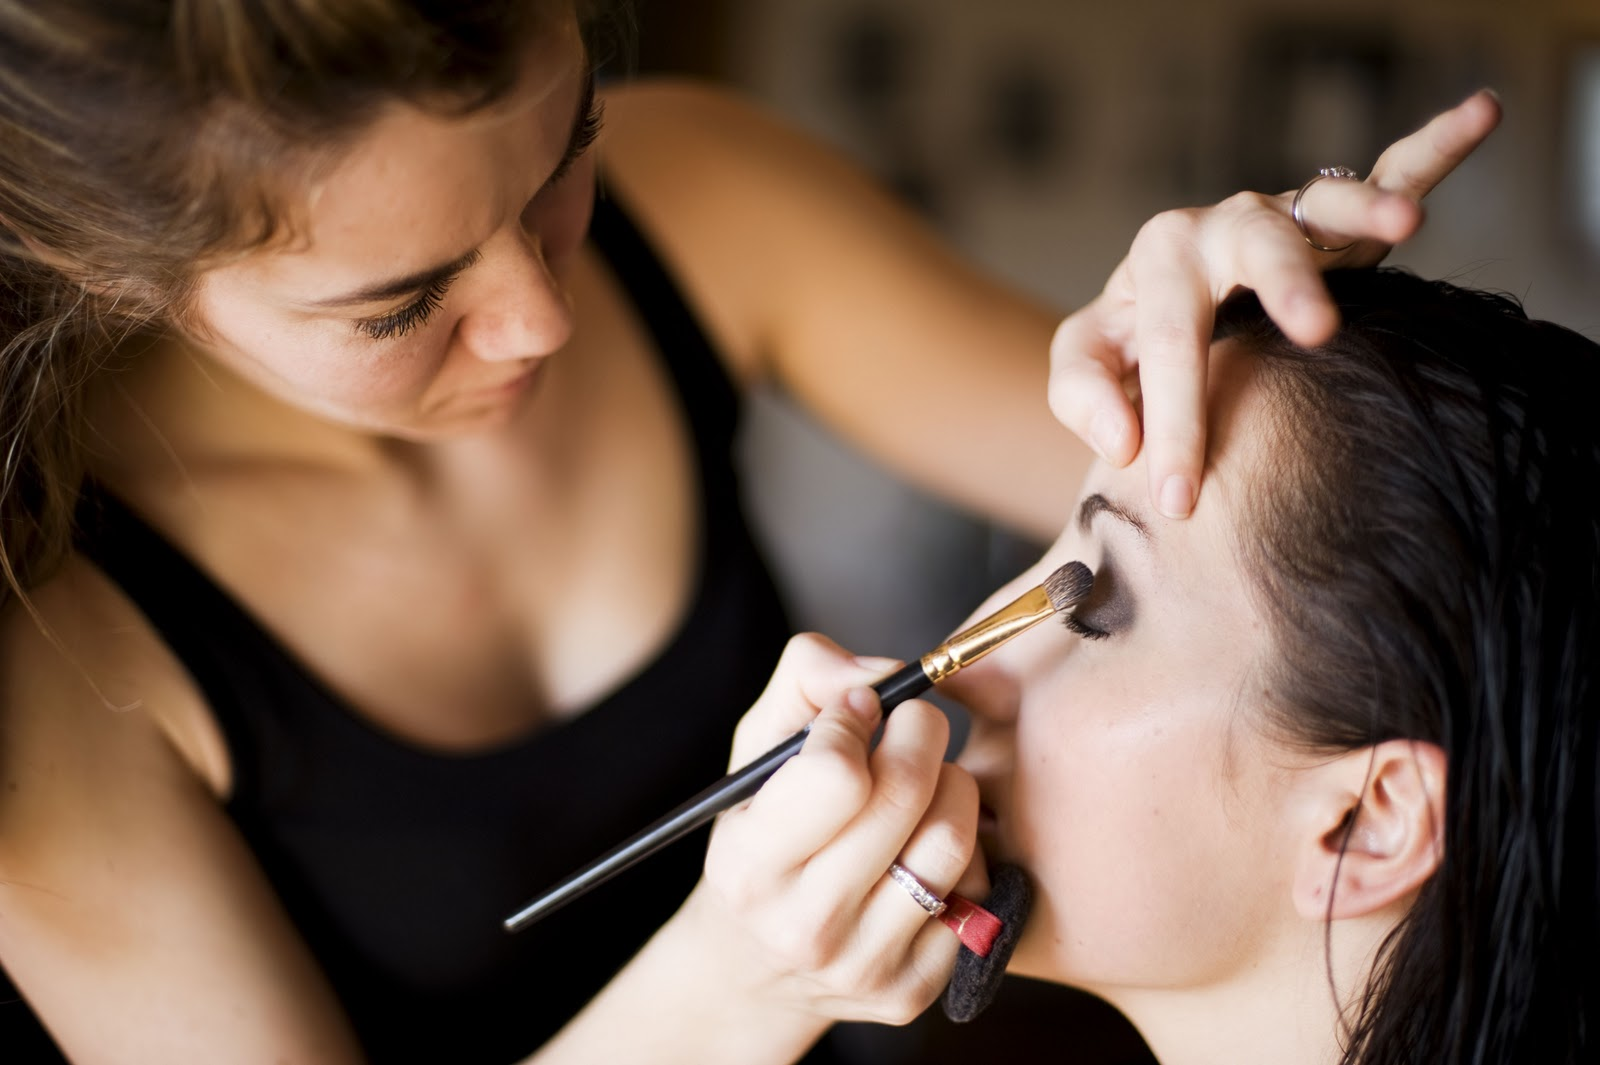 Se Busca Maquillador Maquilladora Para Tv Argentina Argentina Castingscinetv